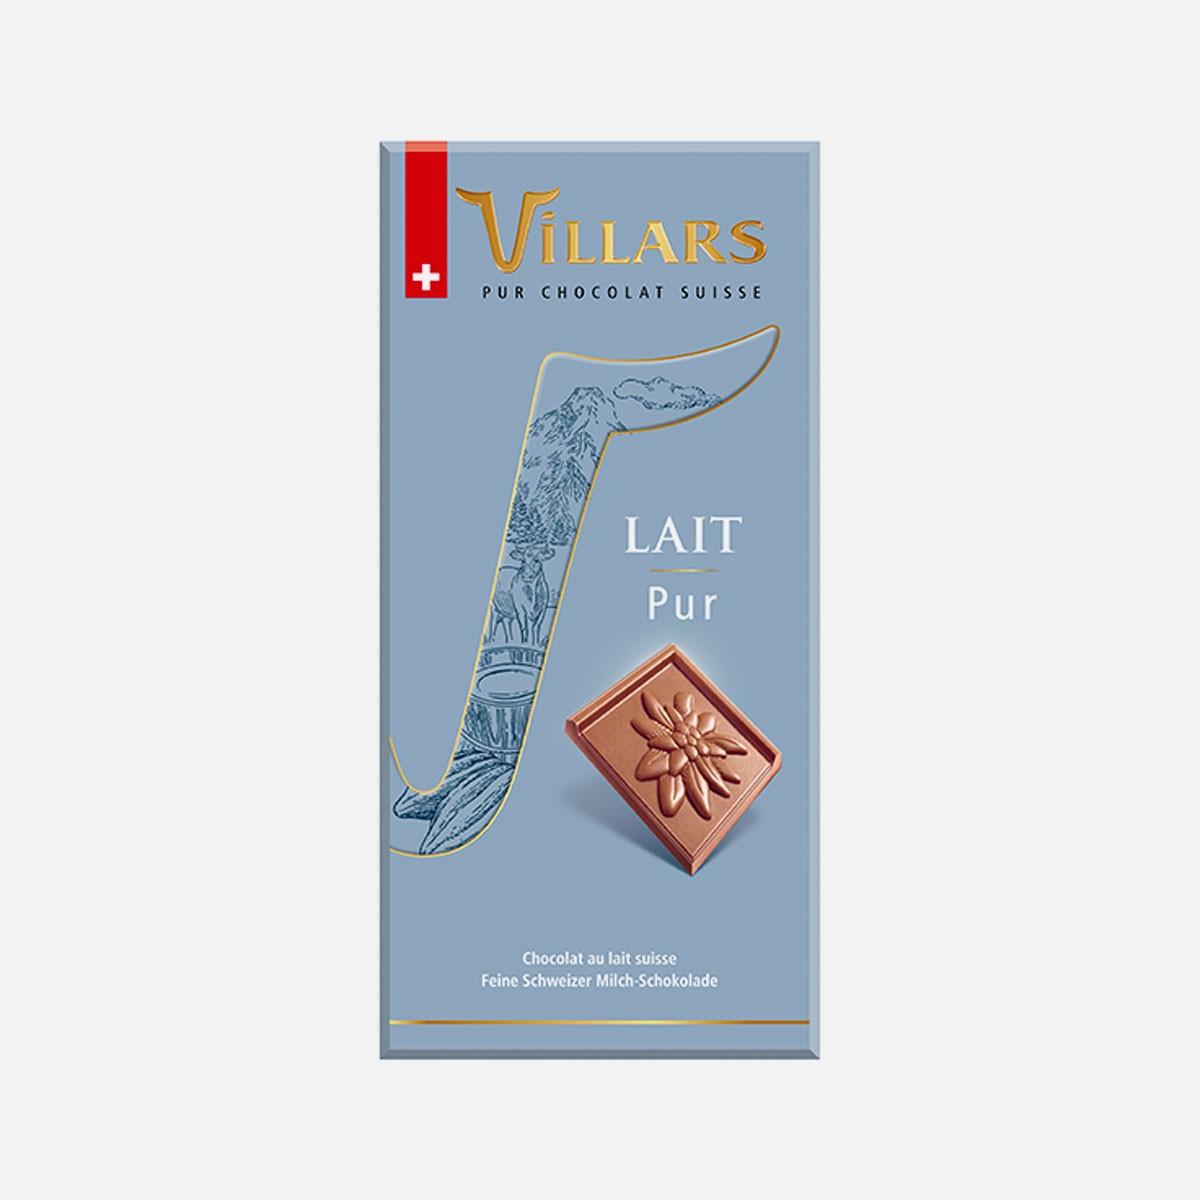 VILLARS LAIT PUR 100g